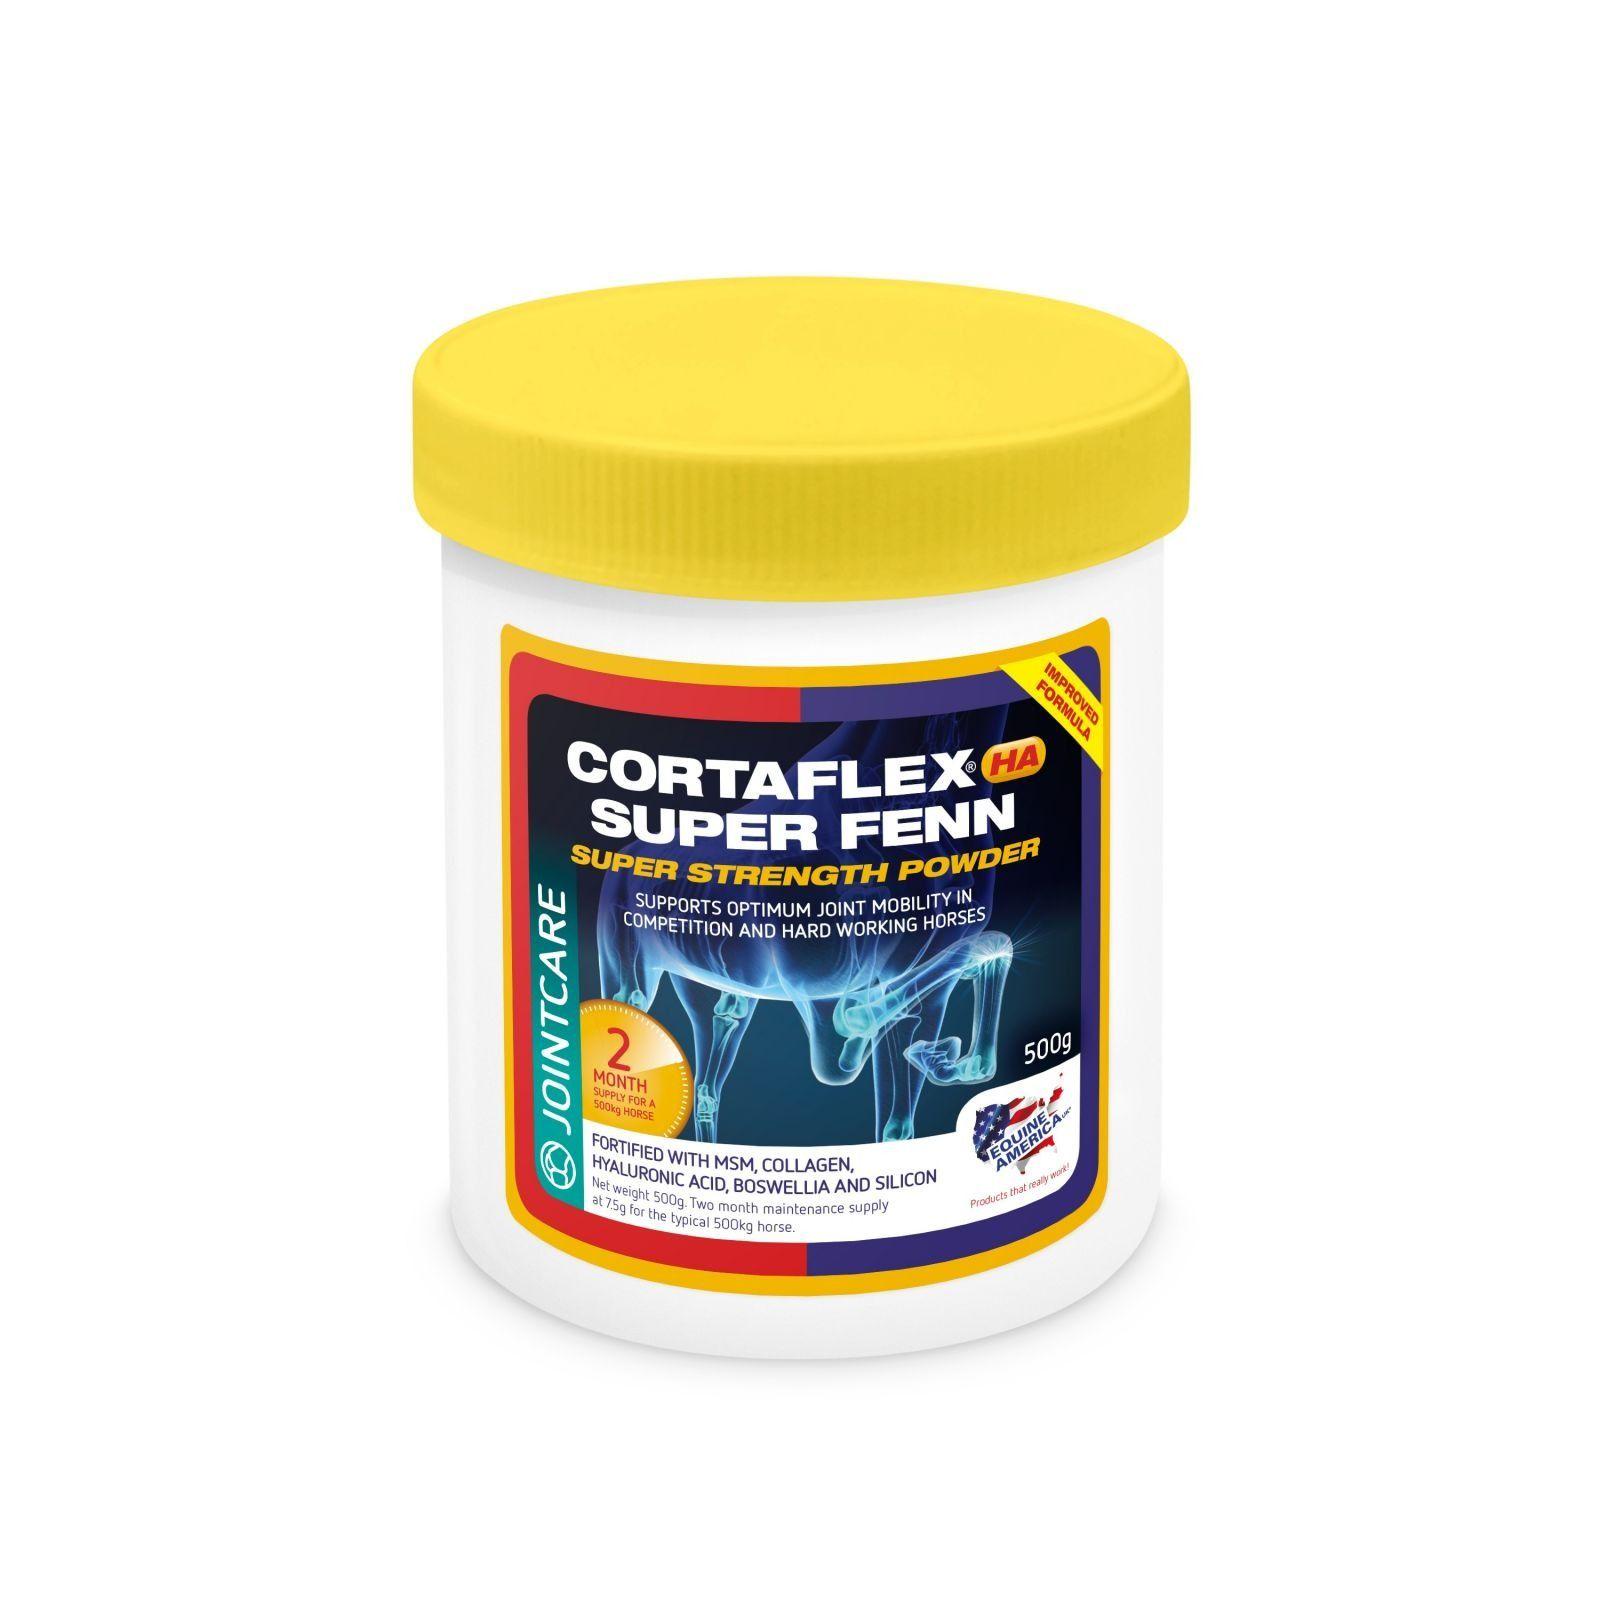 Cortaflex High Strength with Super Fenn